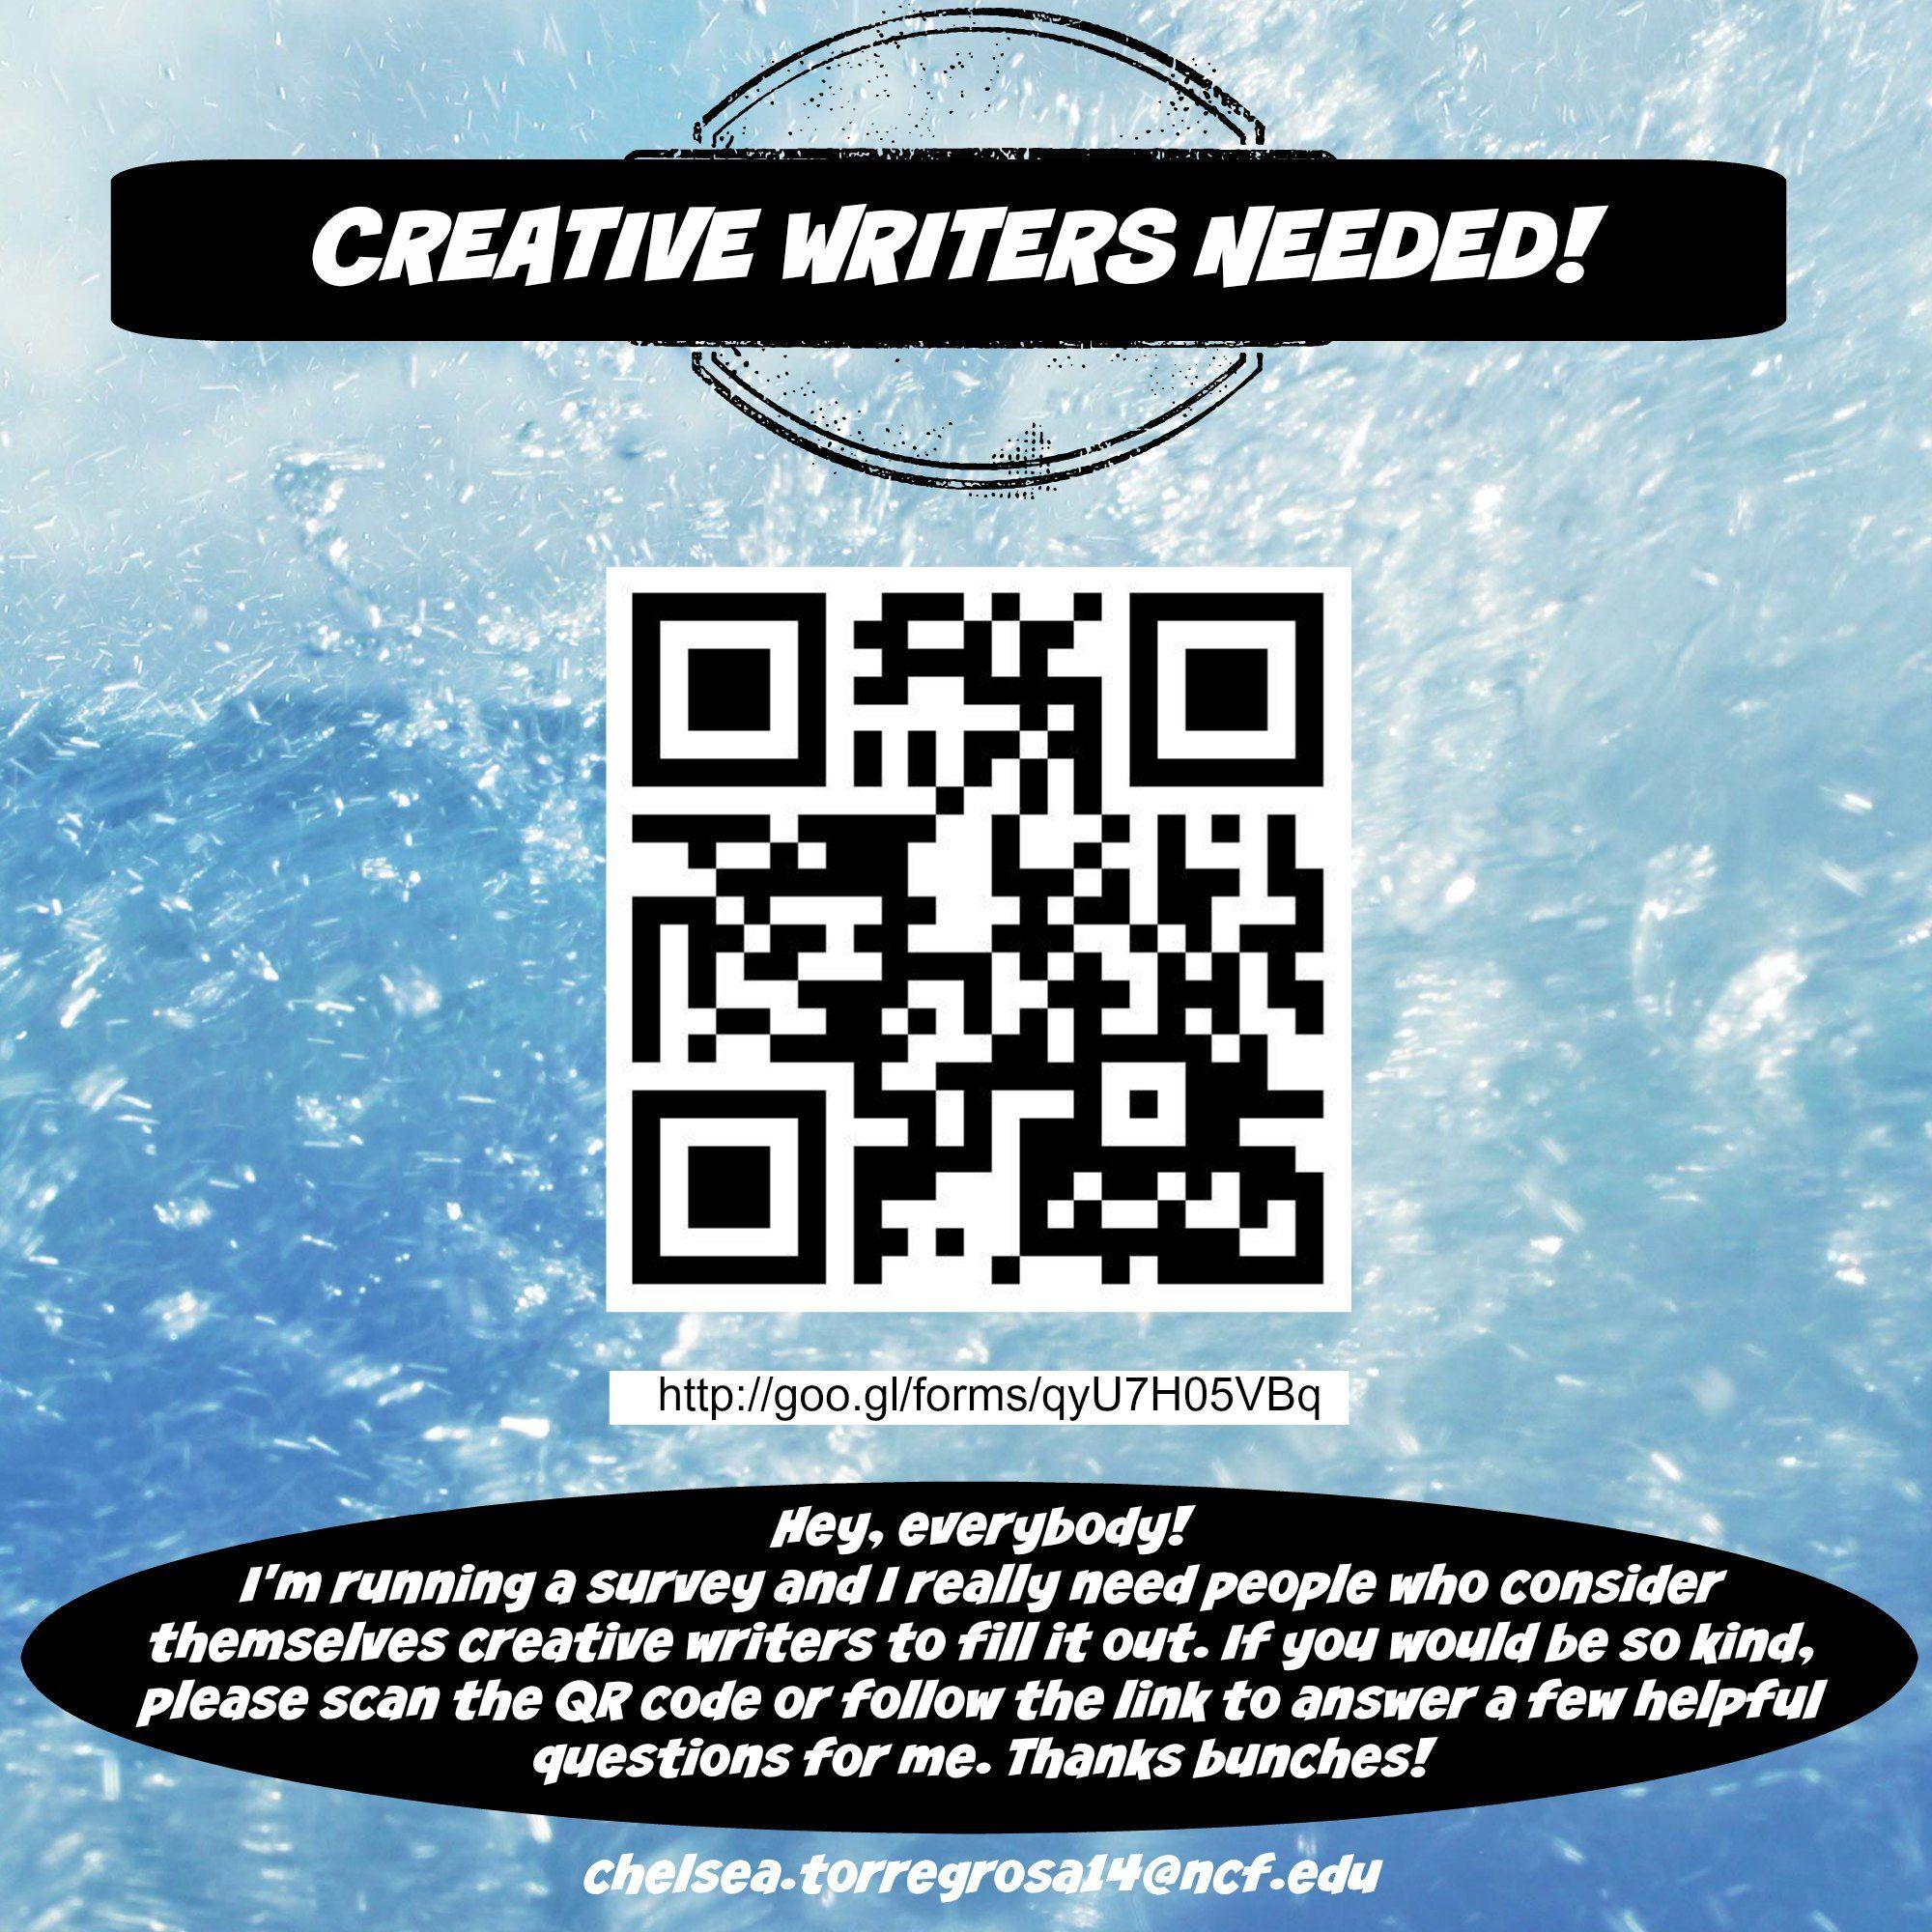 CREATIVE WRITERS NEEDED!!! http://goo.gl/forms/qyU7H05VBq